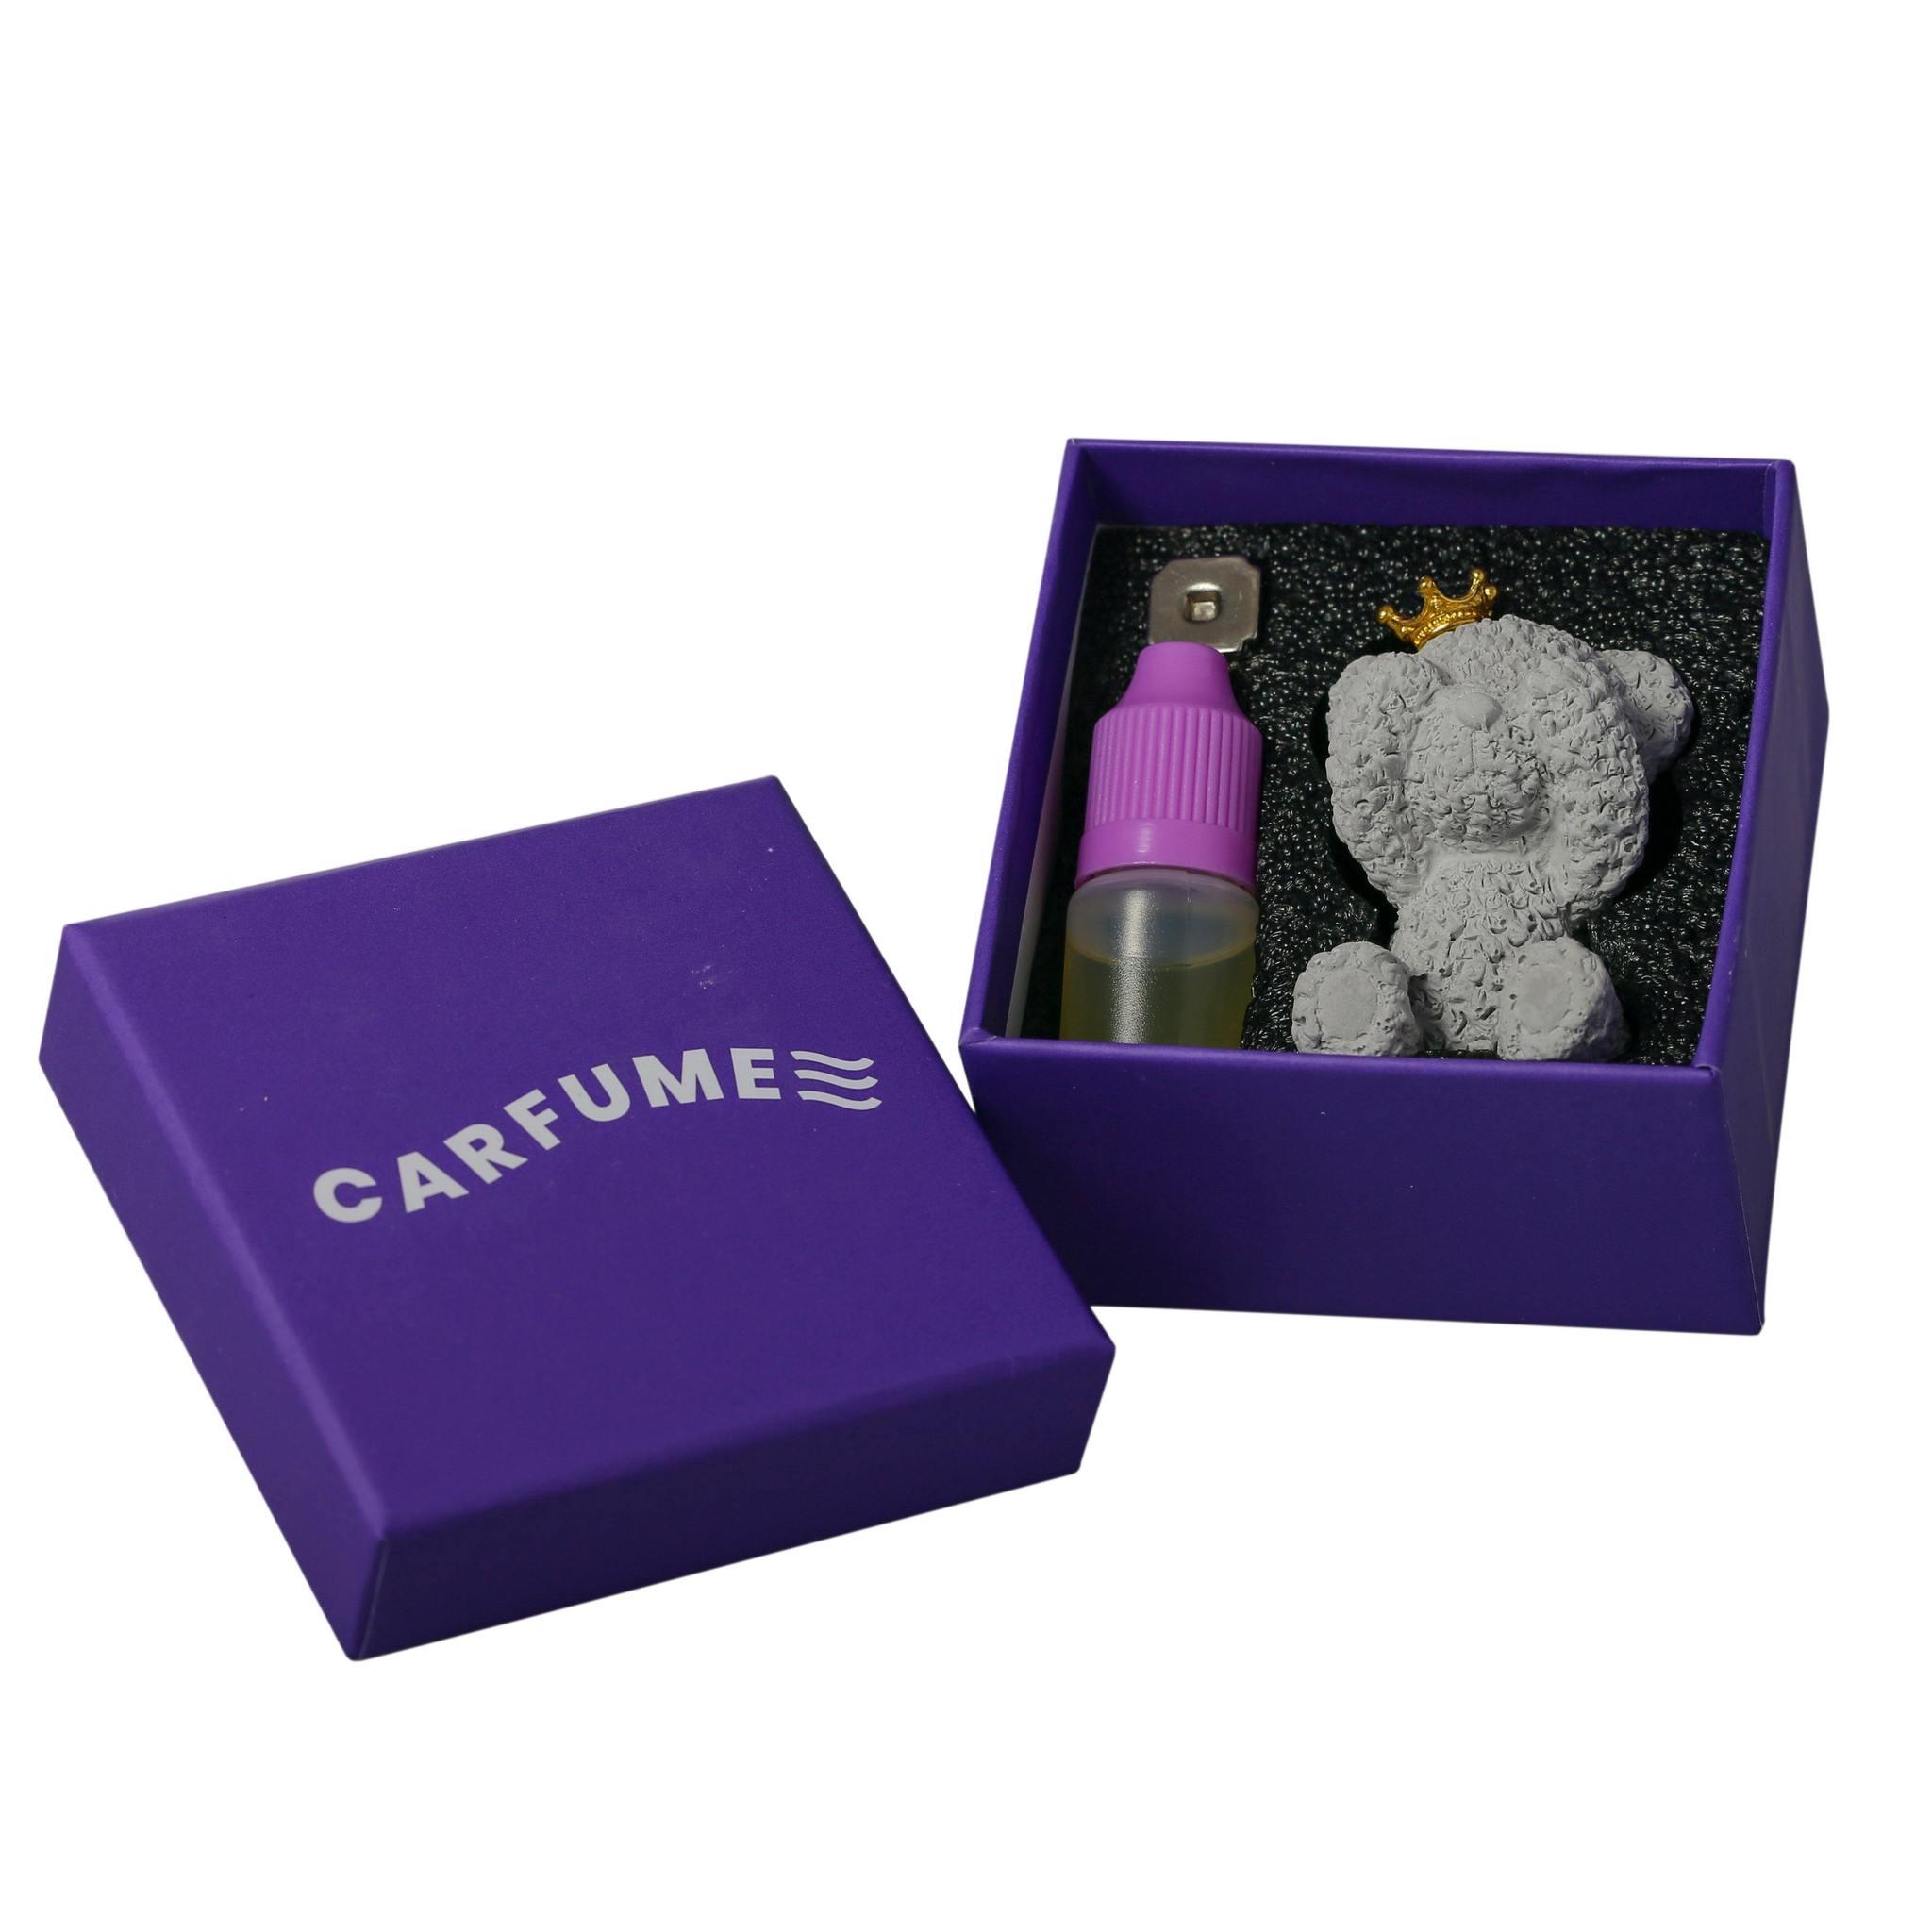 Grey Bear - Carfume